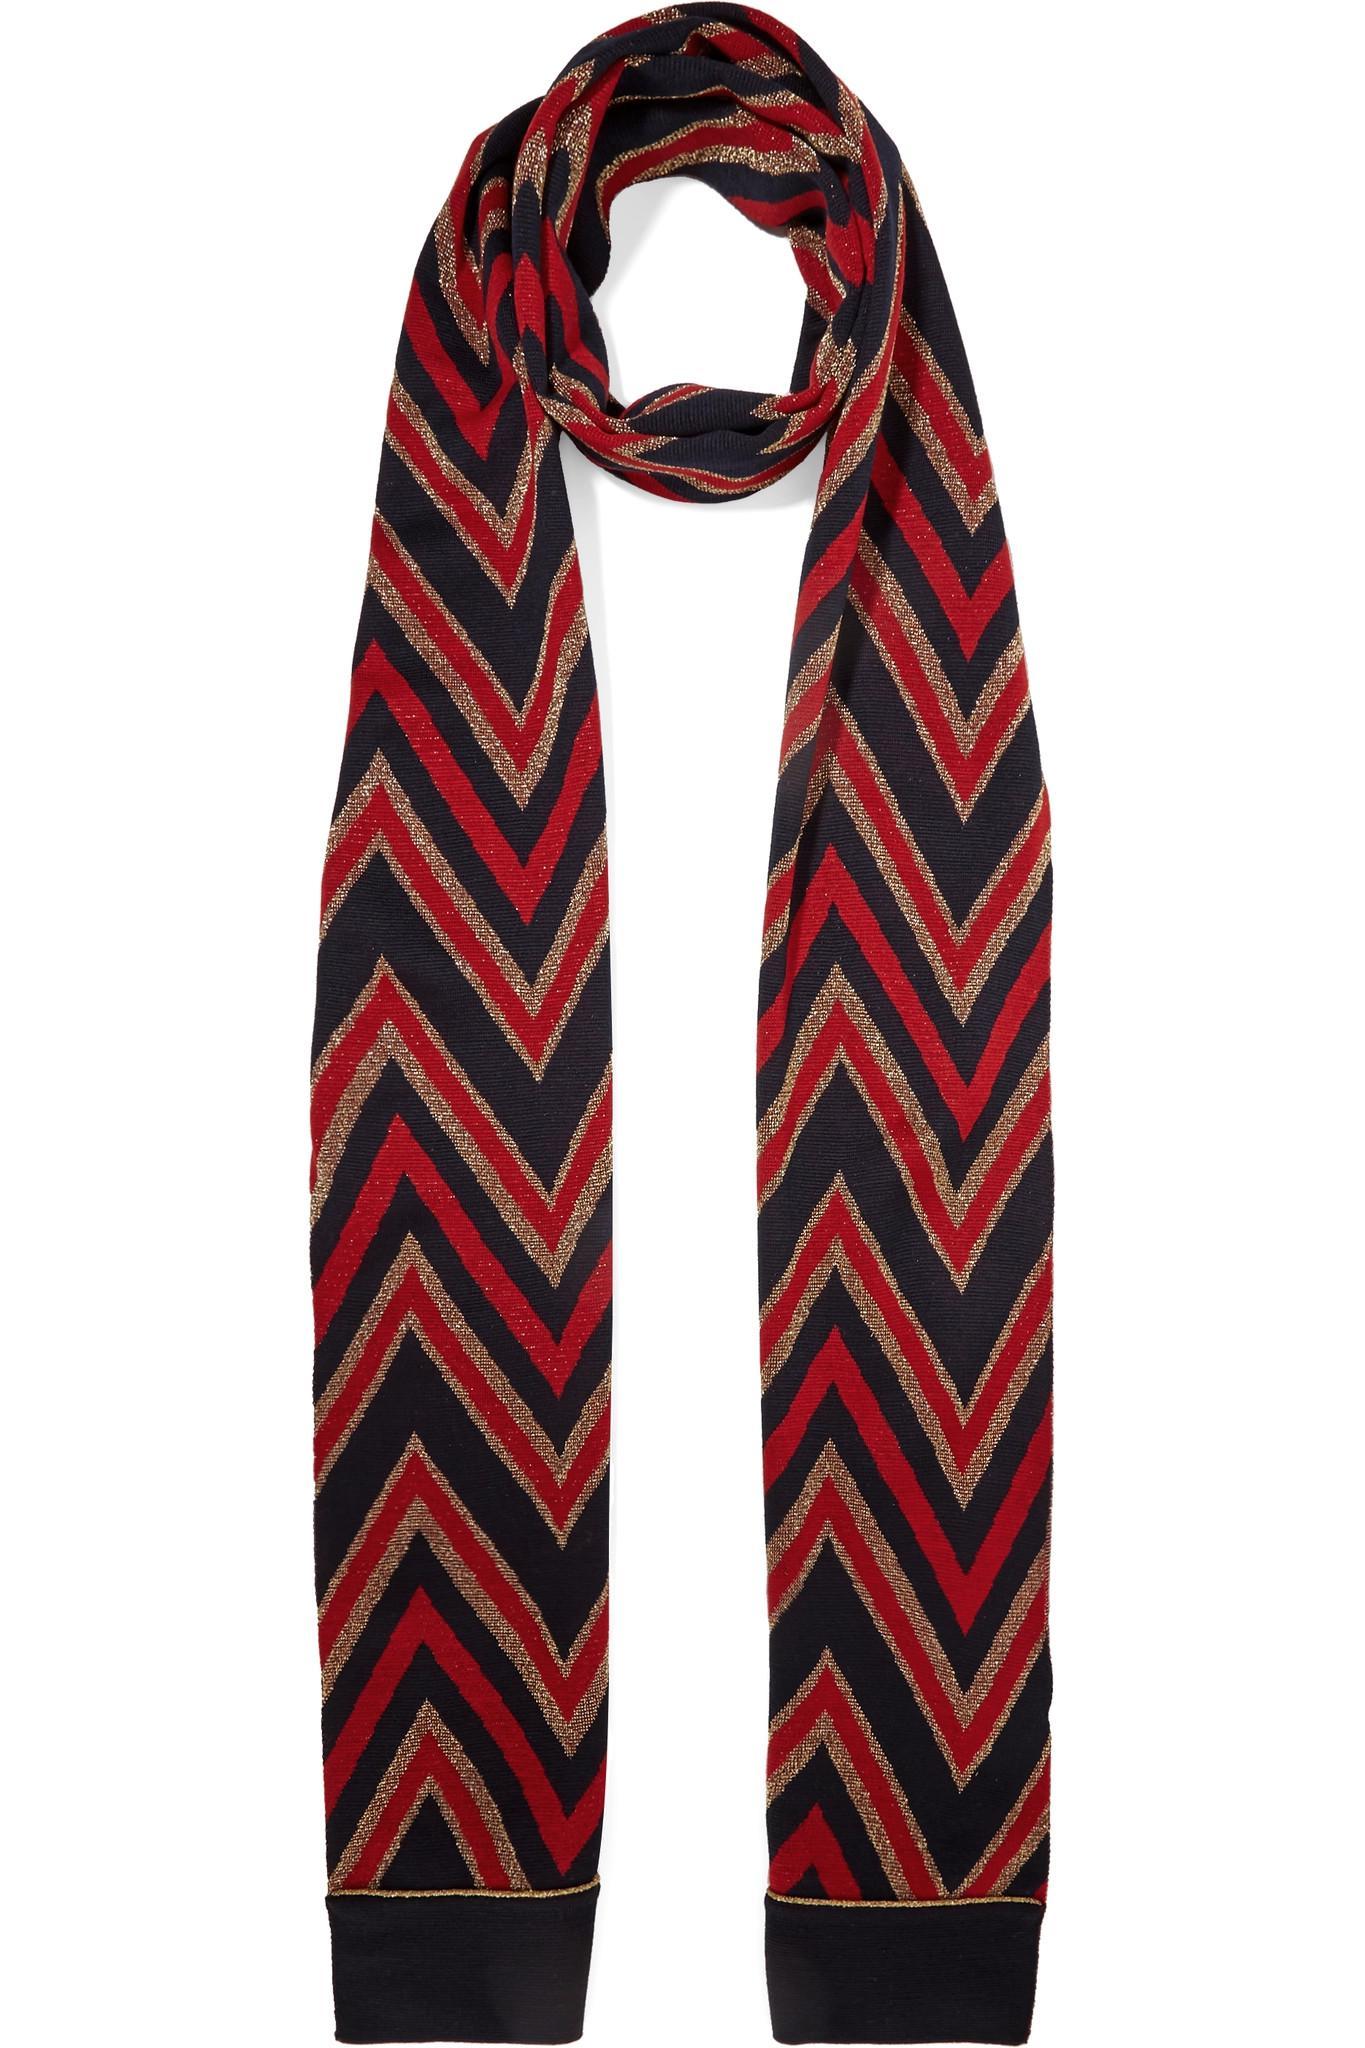 1f671d89ca9 Lyst - Gucci Metallic Wool-blend Jacquard Scarf in Red